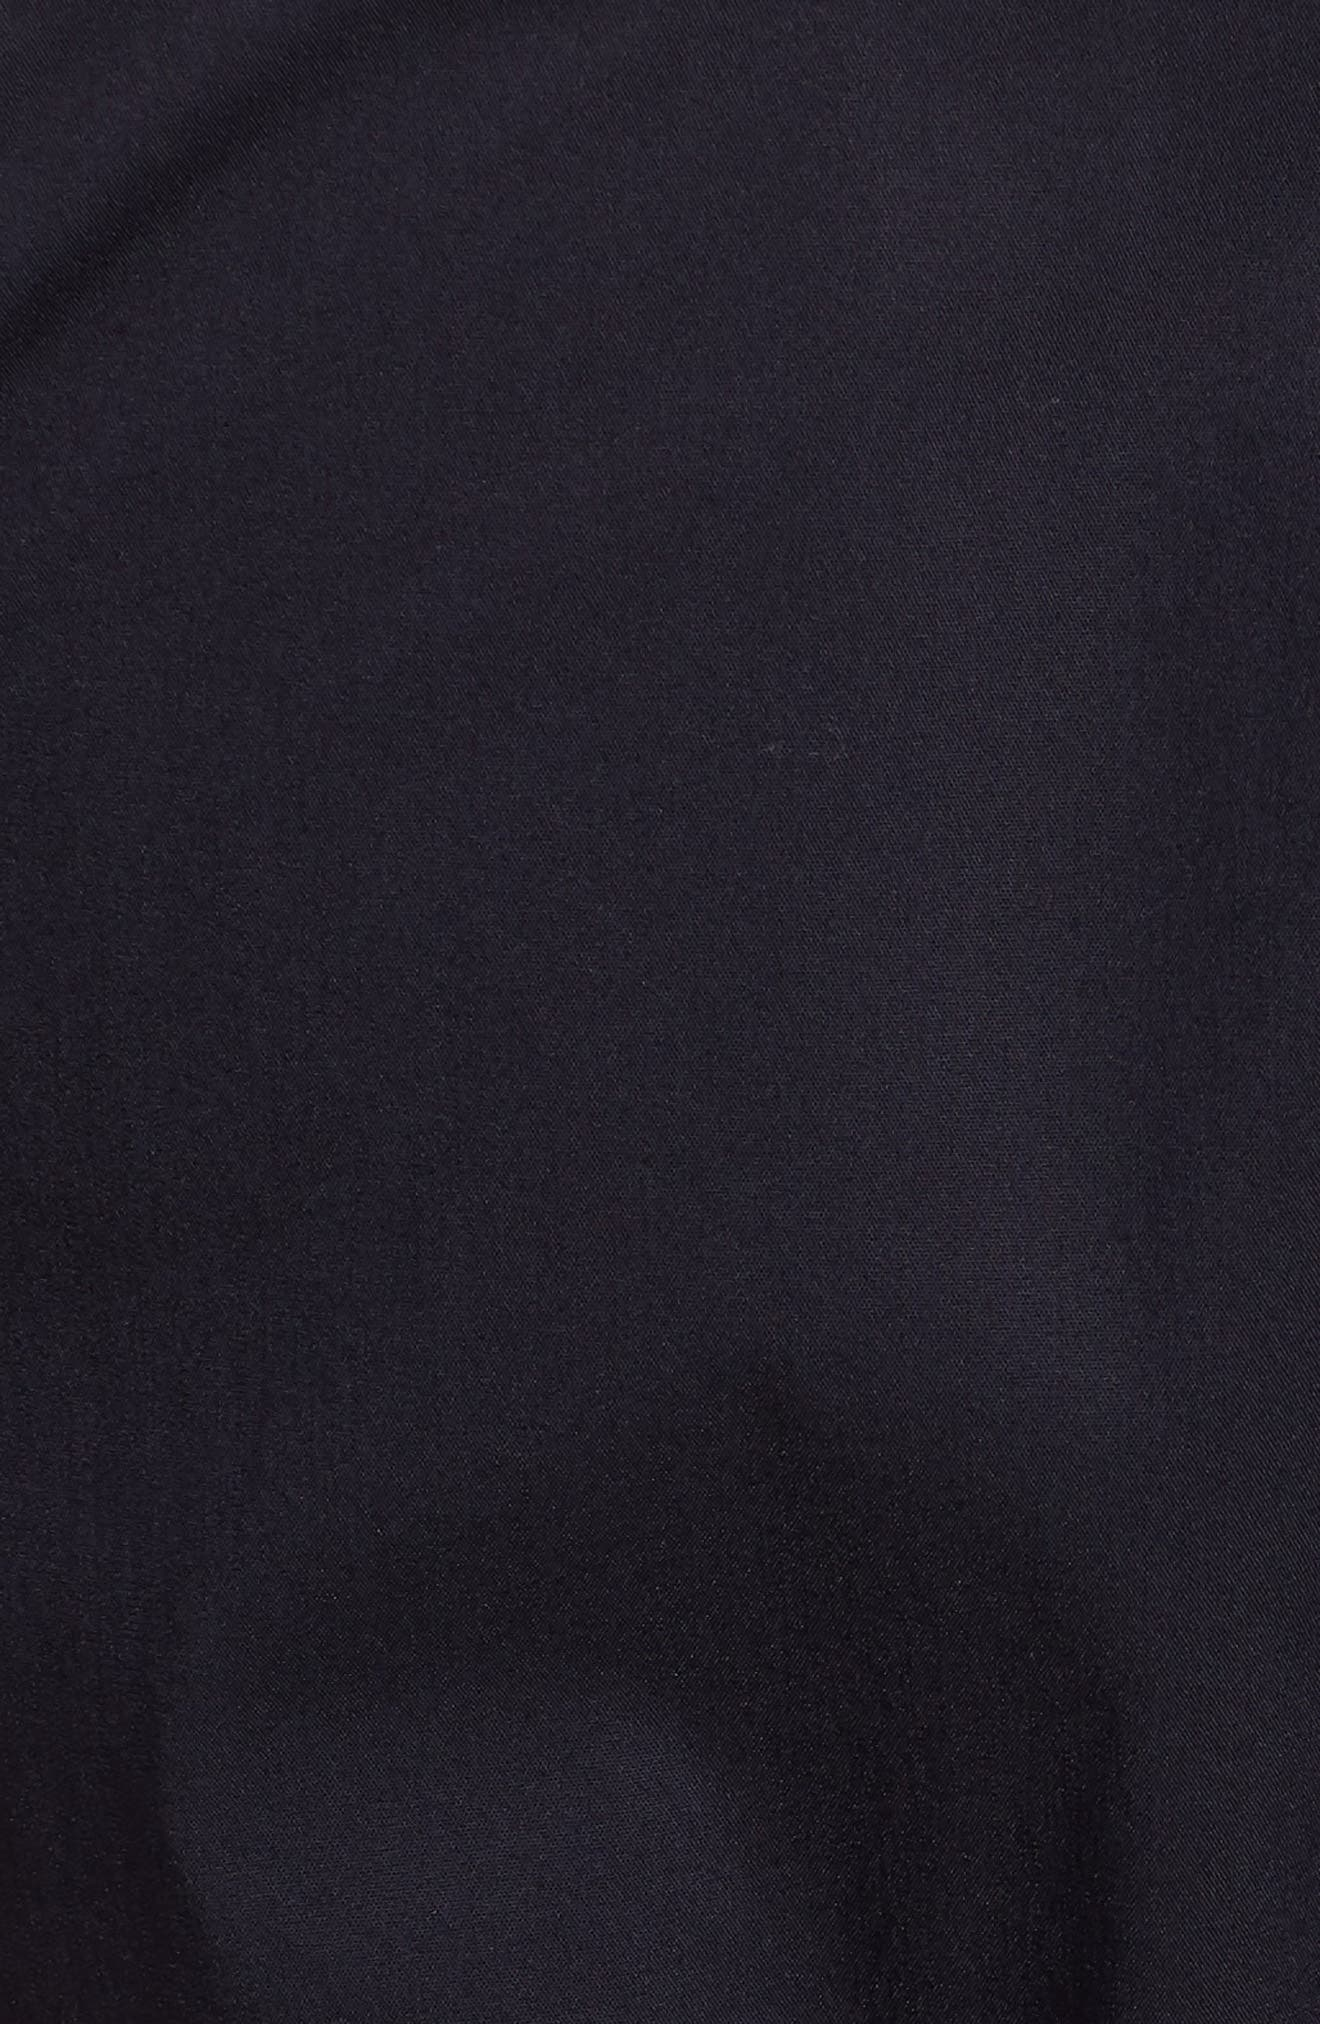 Sleeveless Shirtdress,                             Alternate thumbnail 19, color,